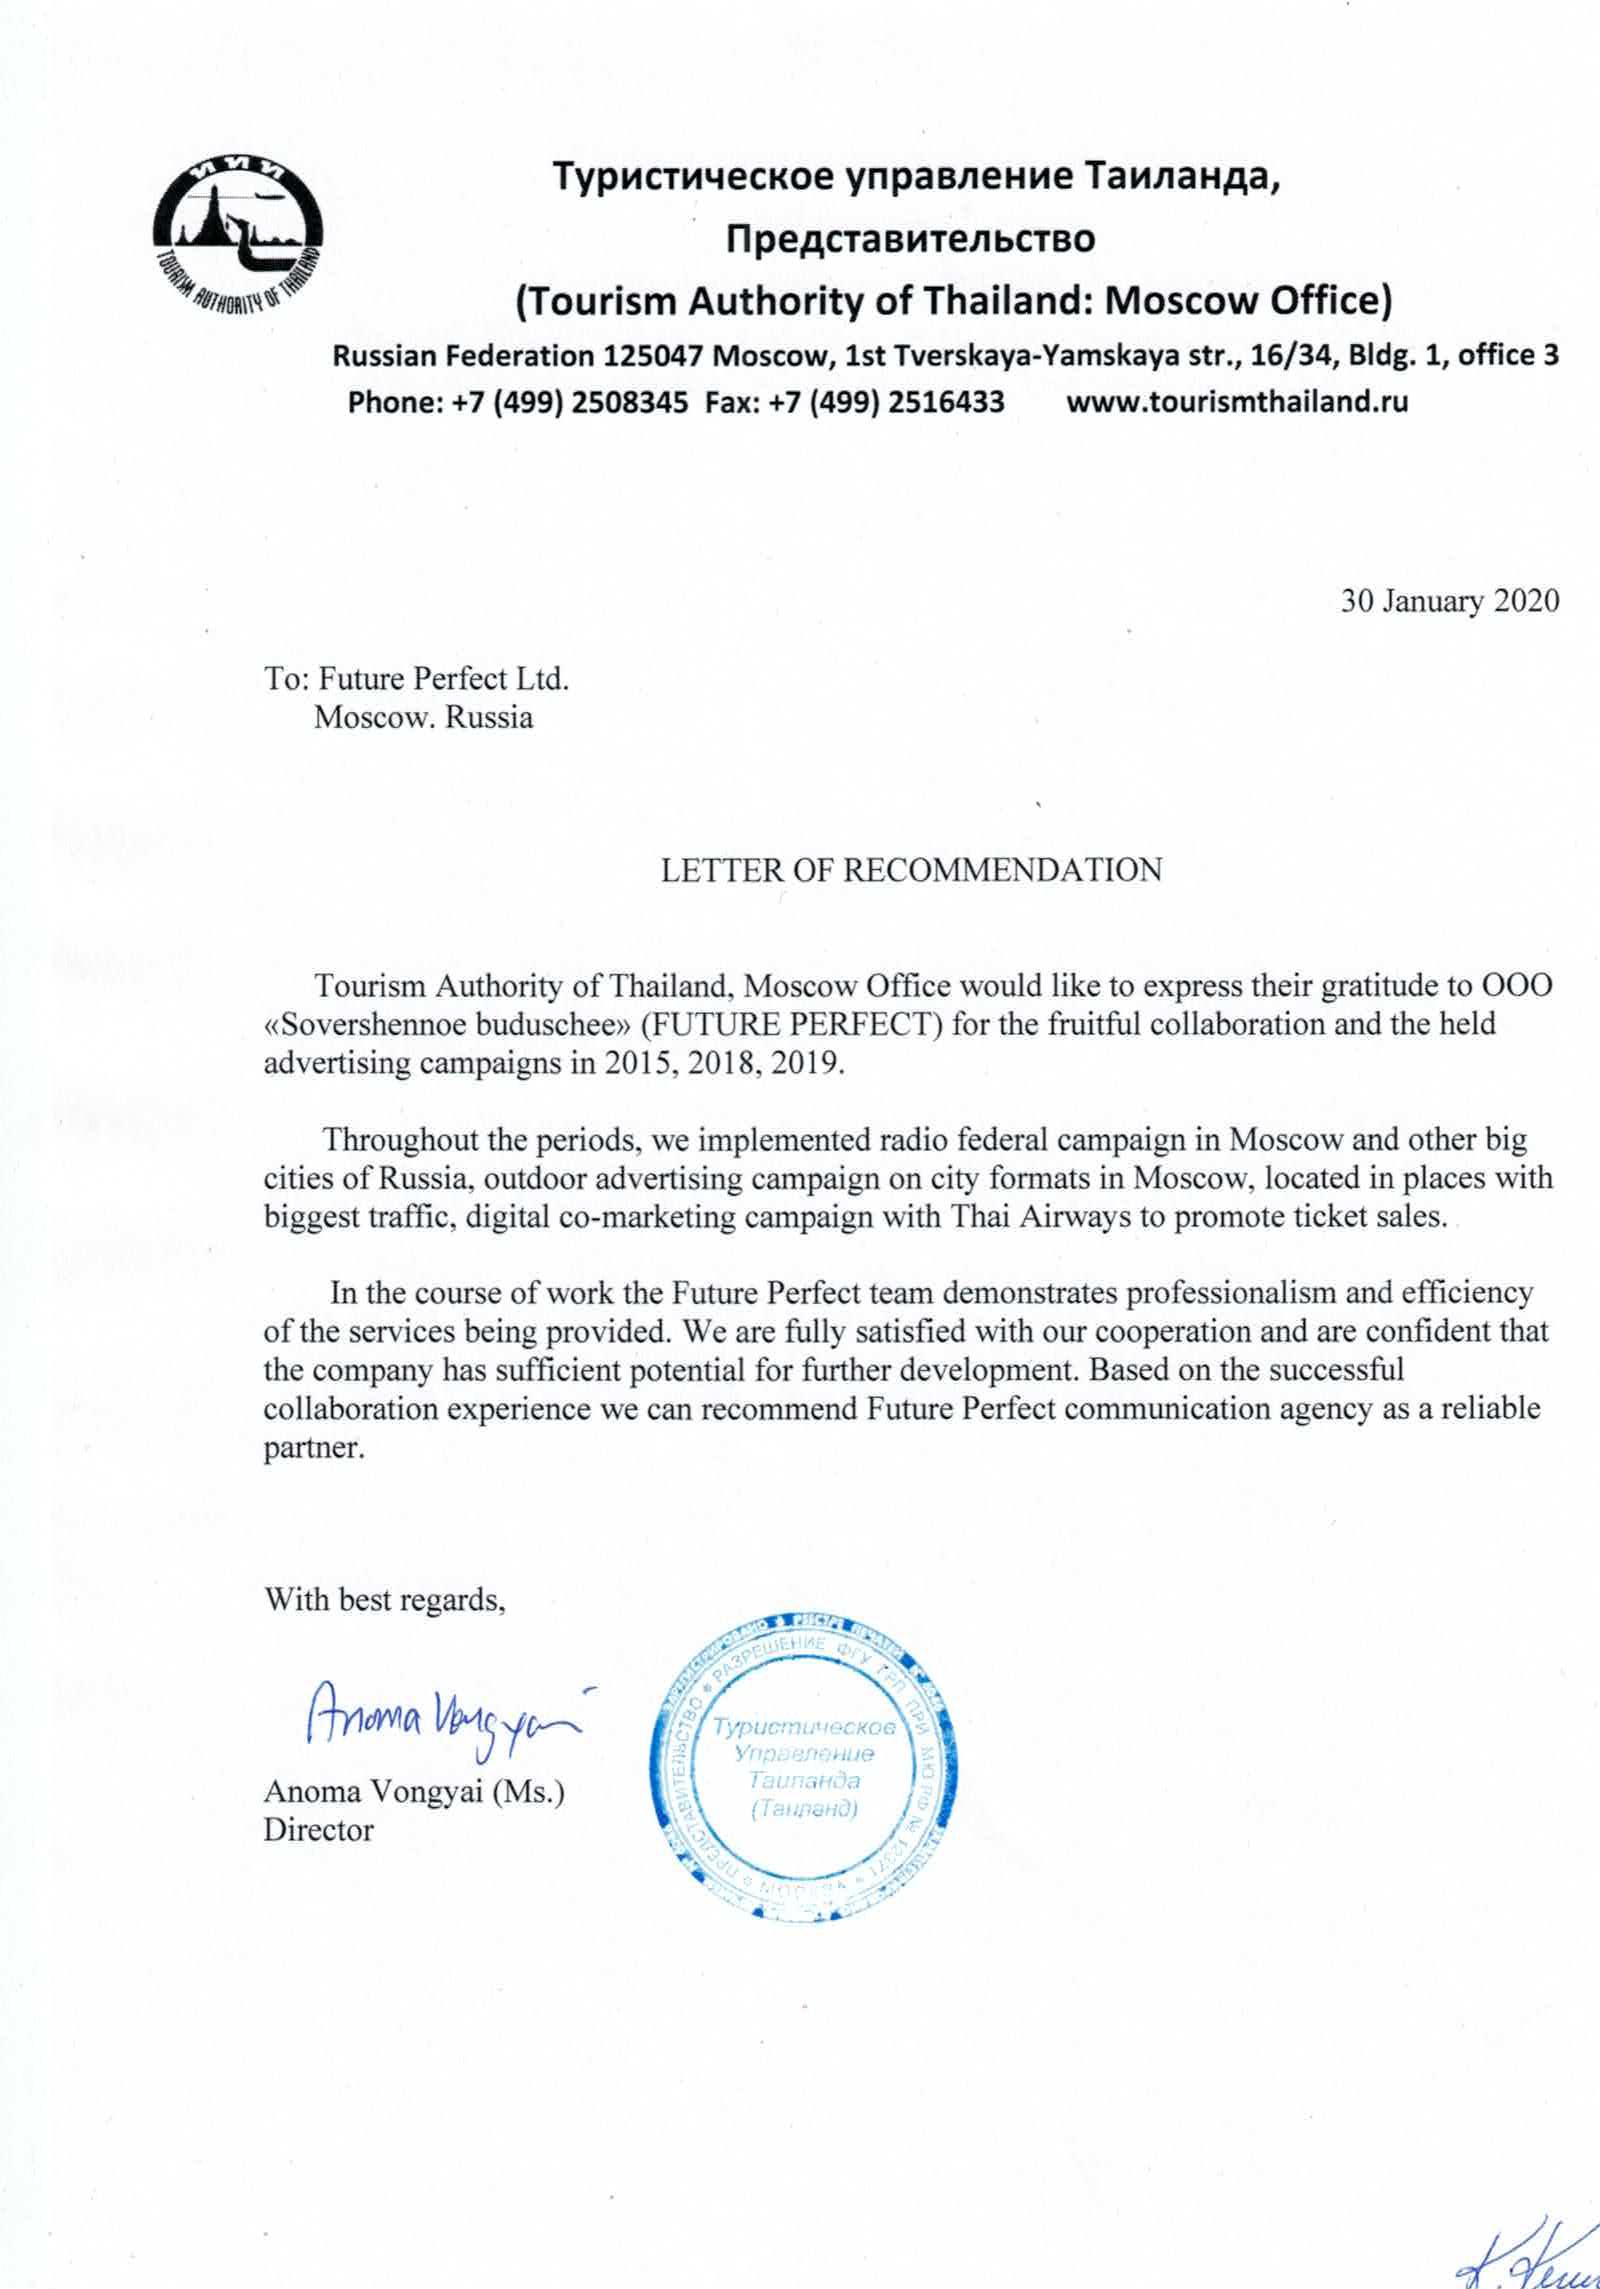 Thailand Reccomendation letter